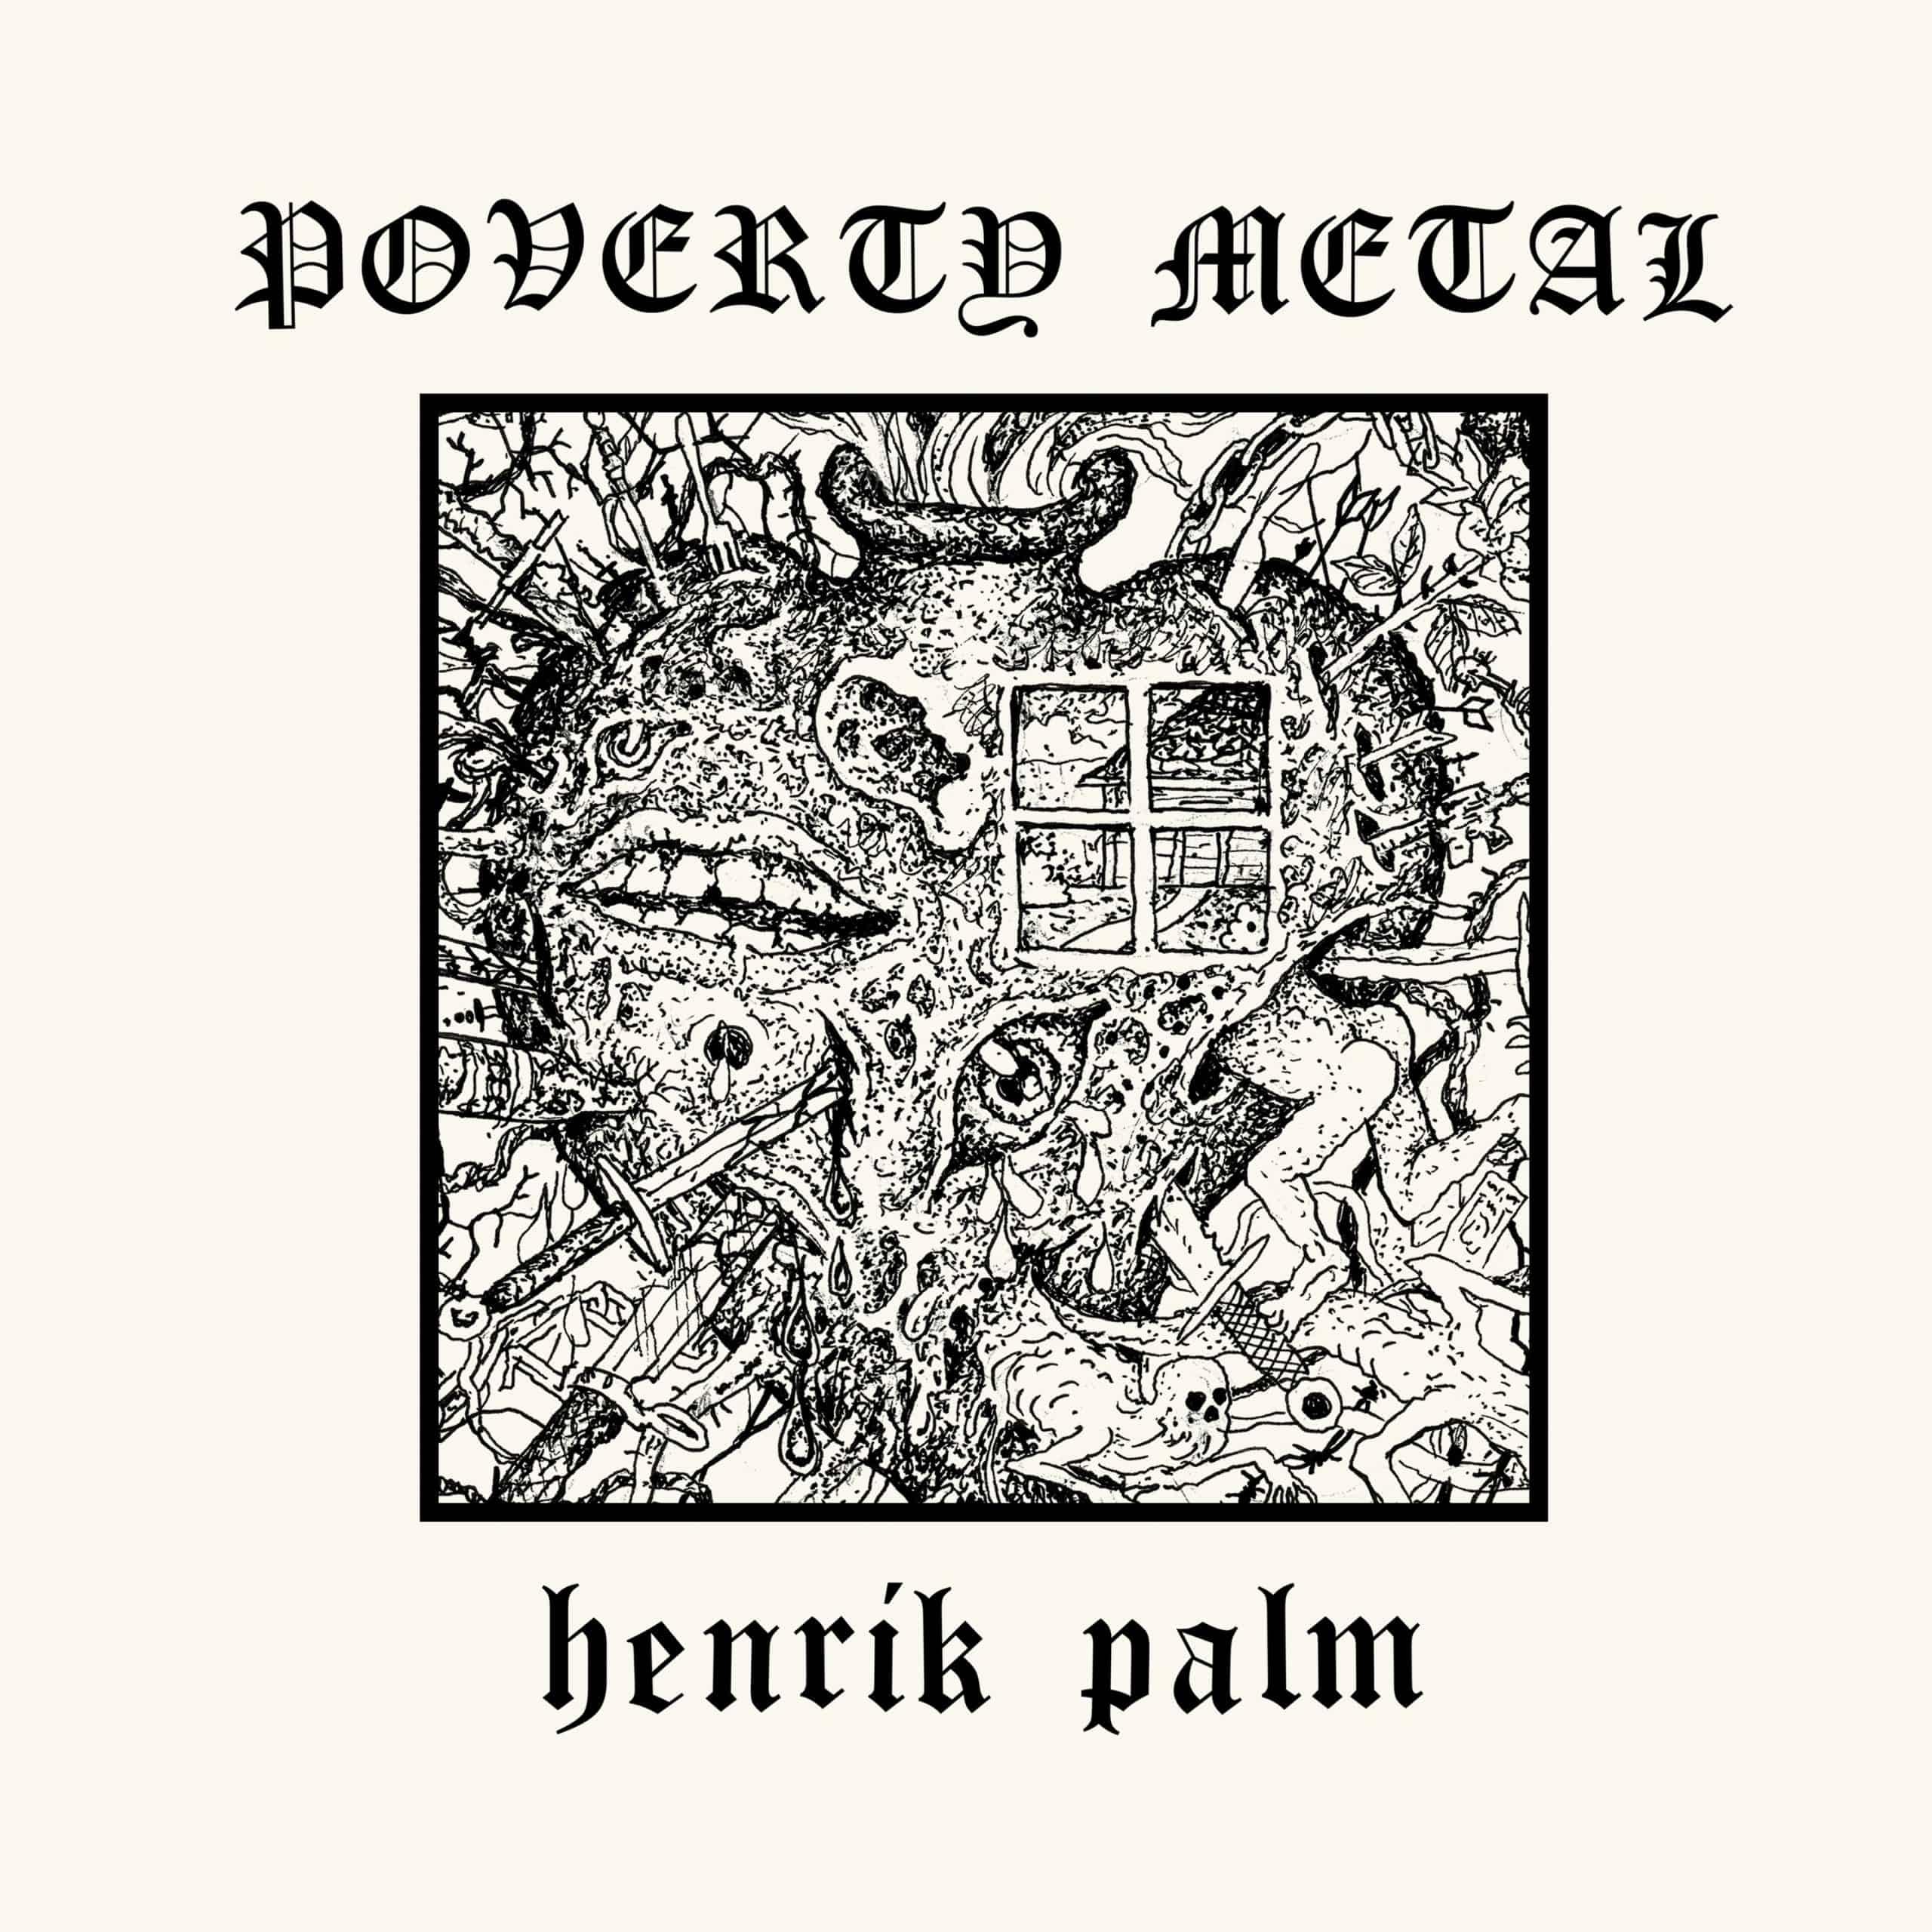 Hendrik Palm Poverty Metal Cover